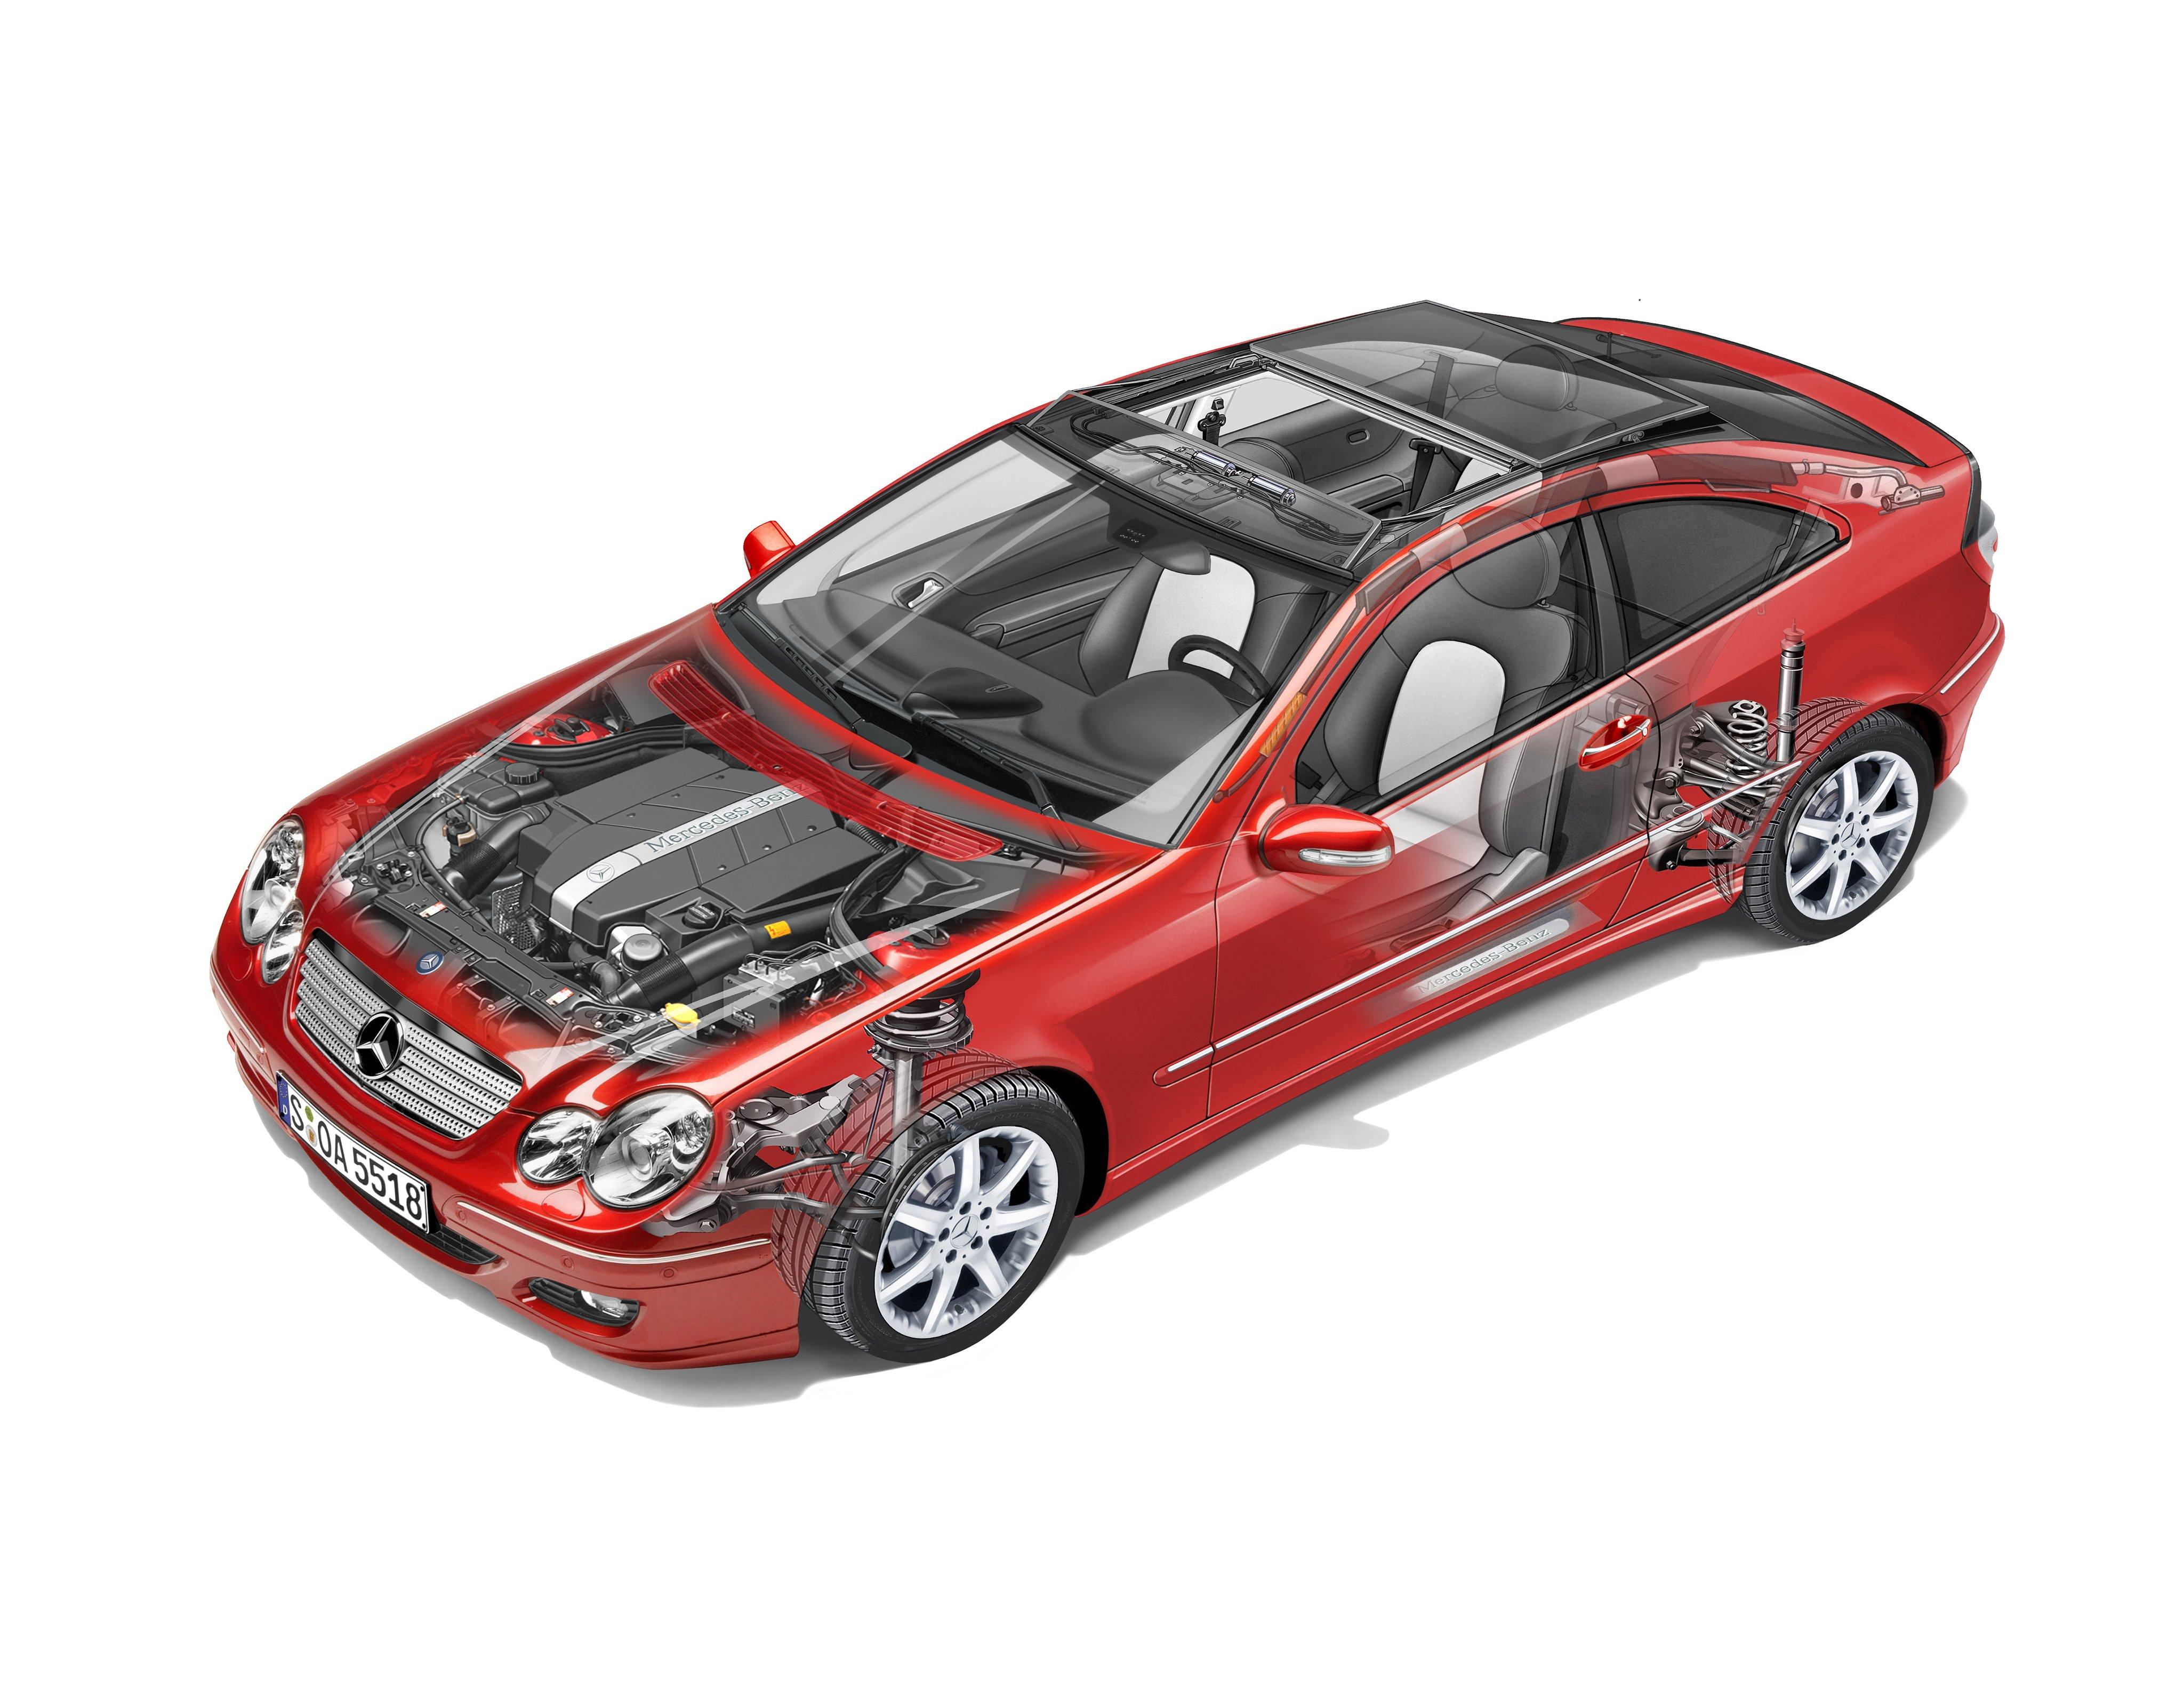 mercedes benz c class sport coupe cars technical cutaway. Black Bedroom Furniture Sets. Home Design Ideas